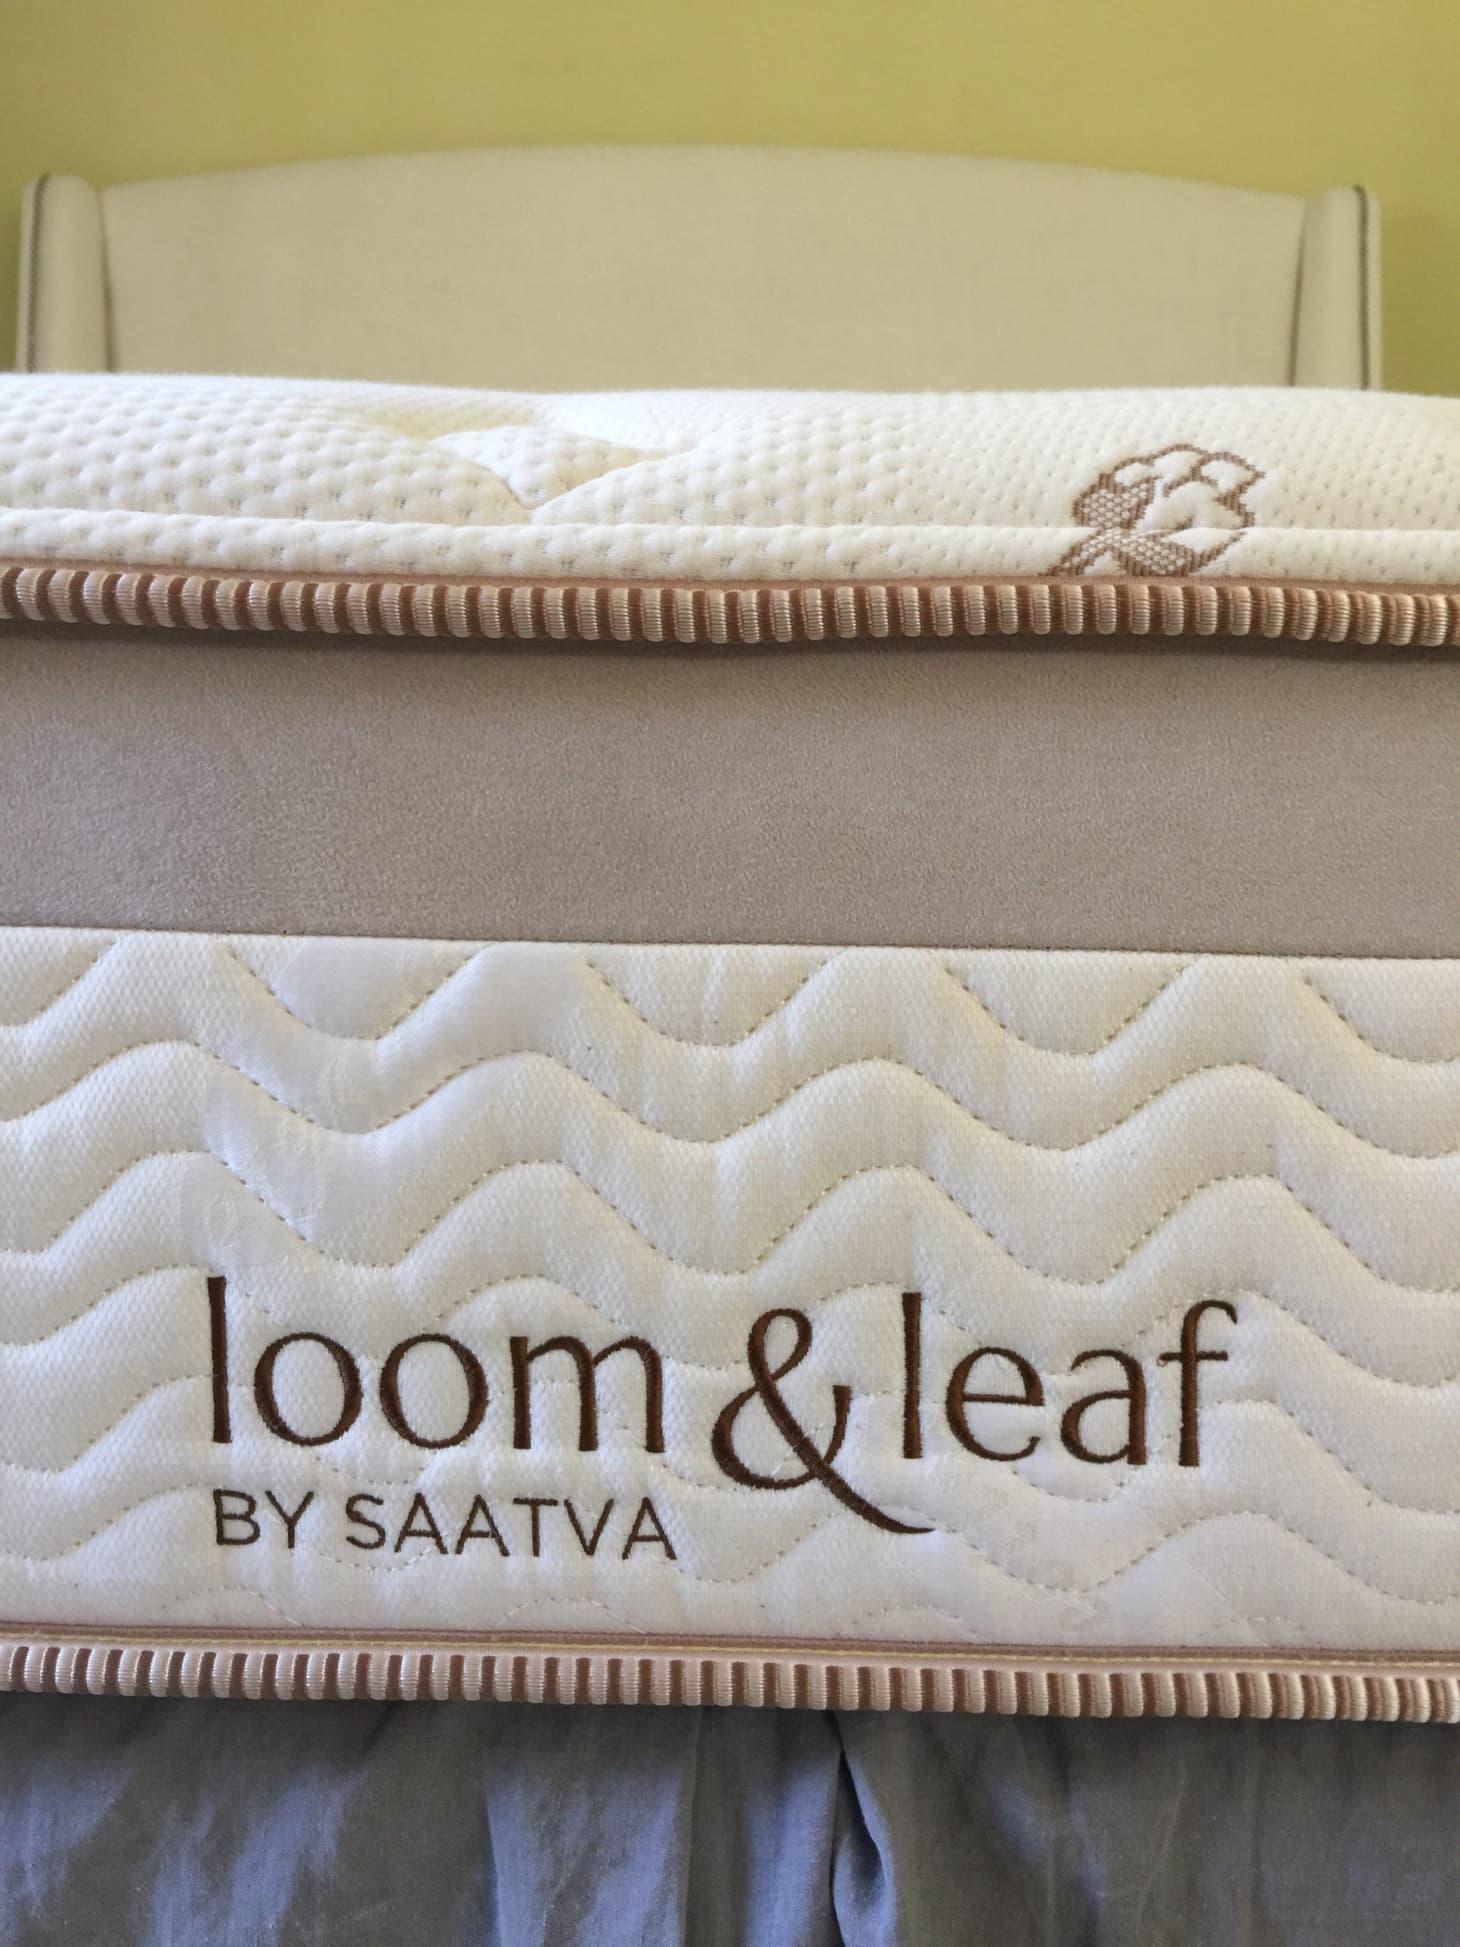 Review of Saatva's Loom & Leaf Memory Foam Mattress